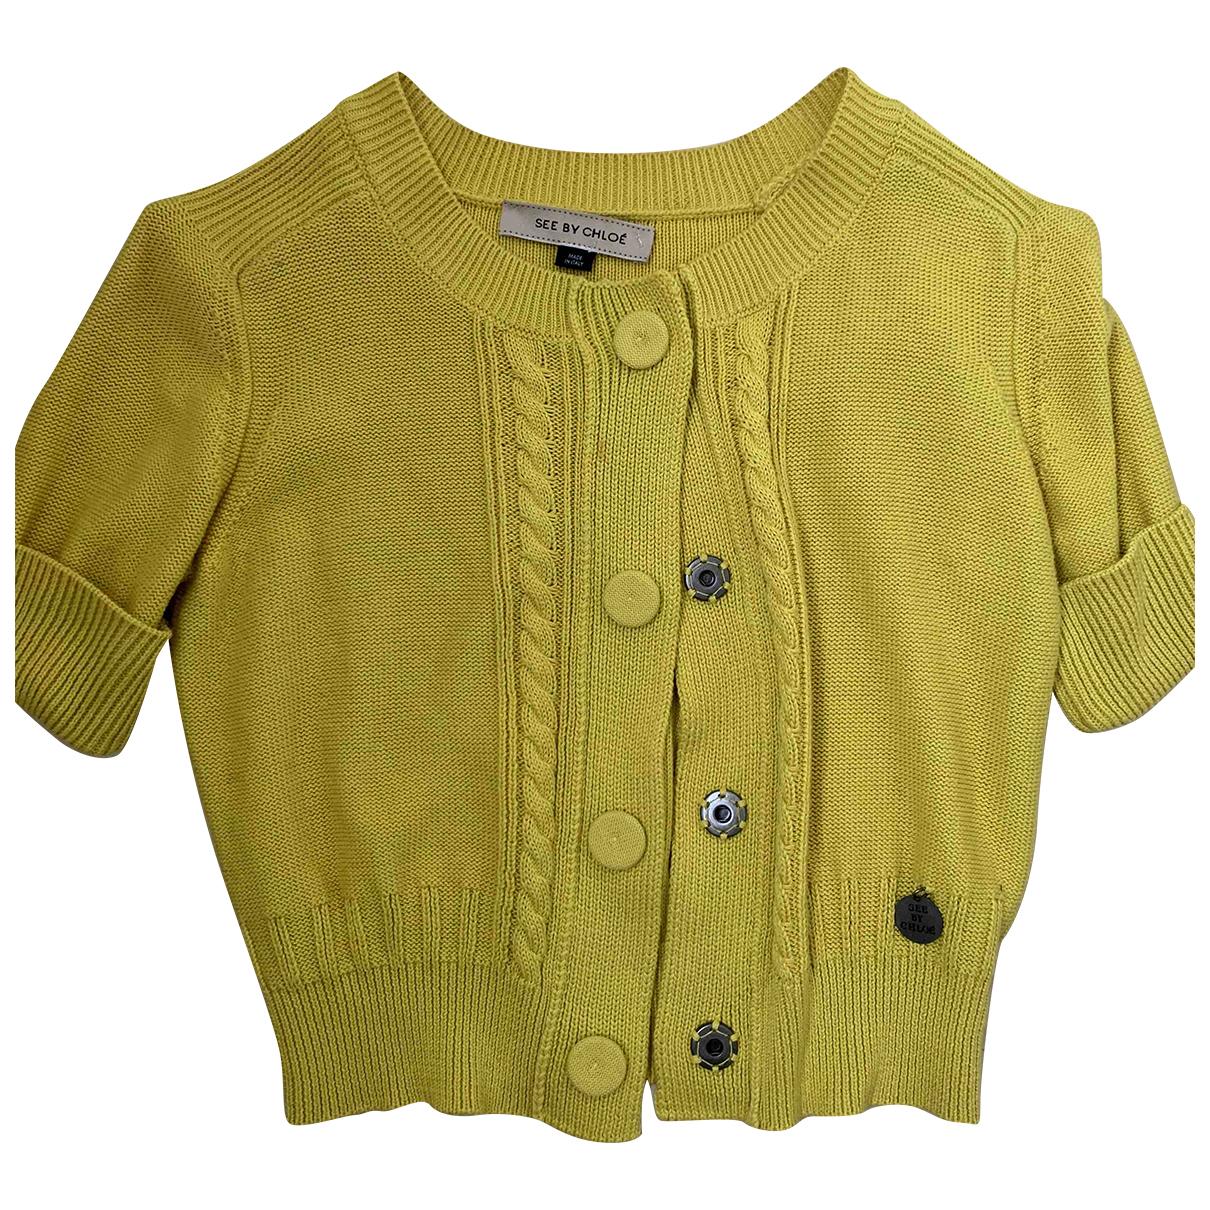 See By Chloe - Pull   pour femme en coton - jaune